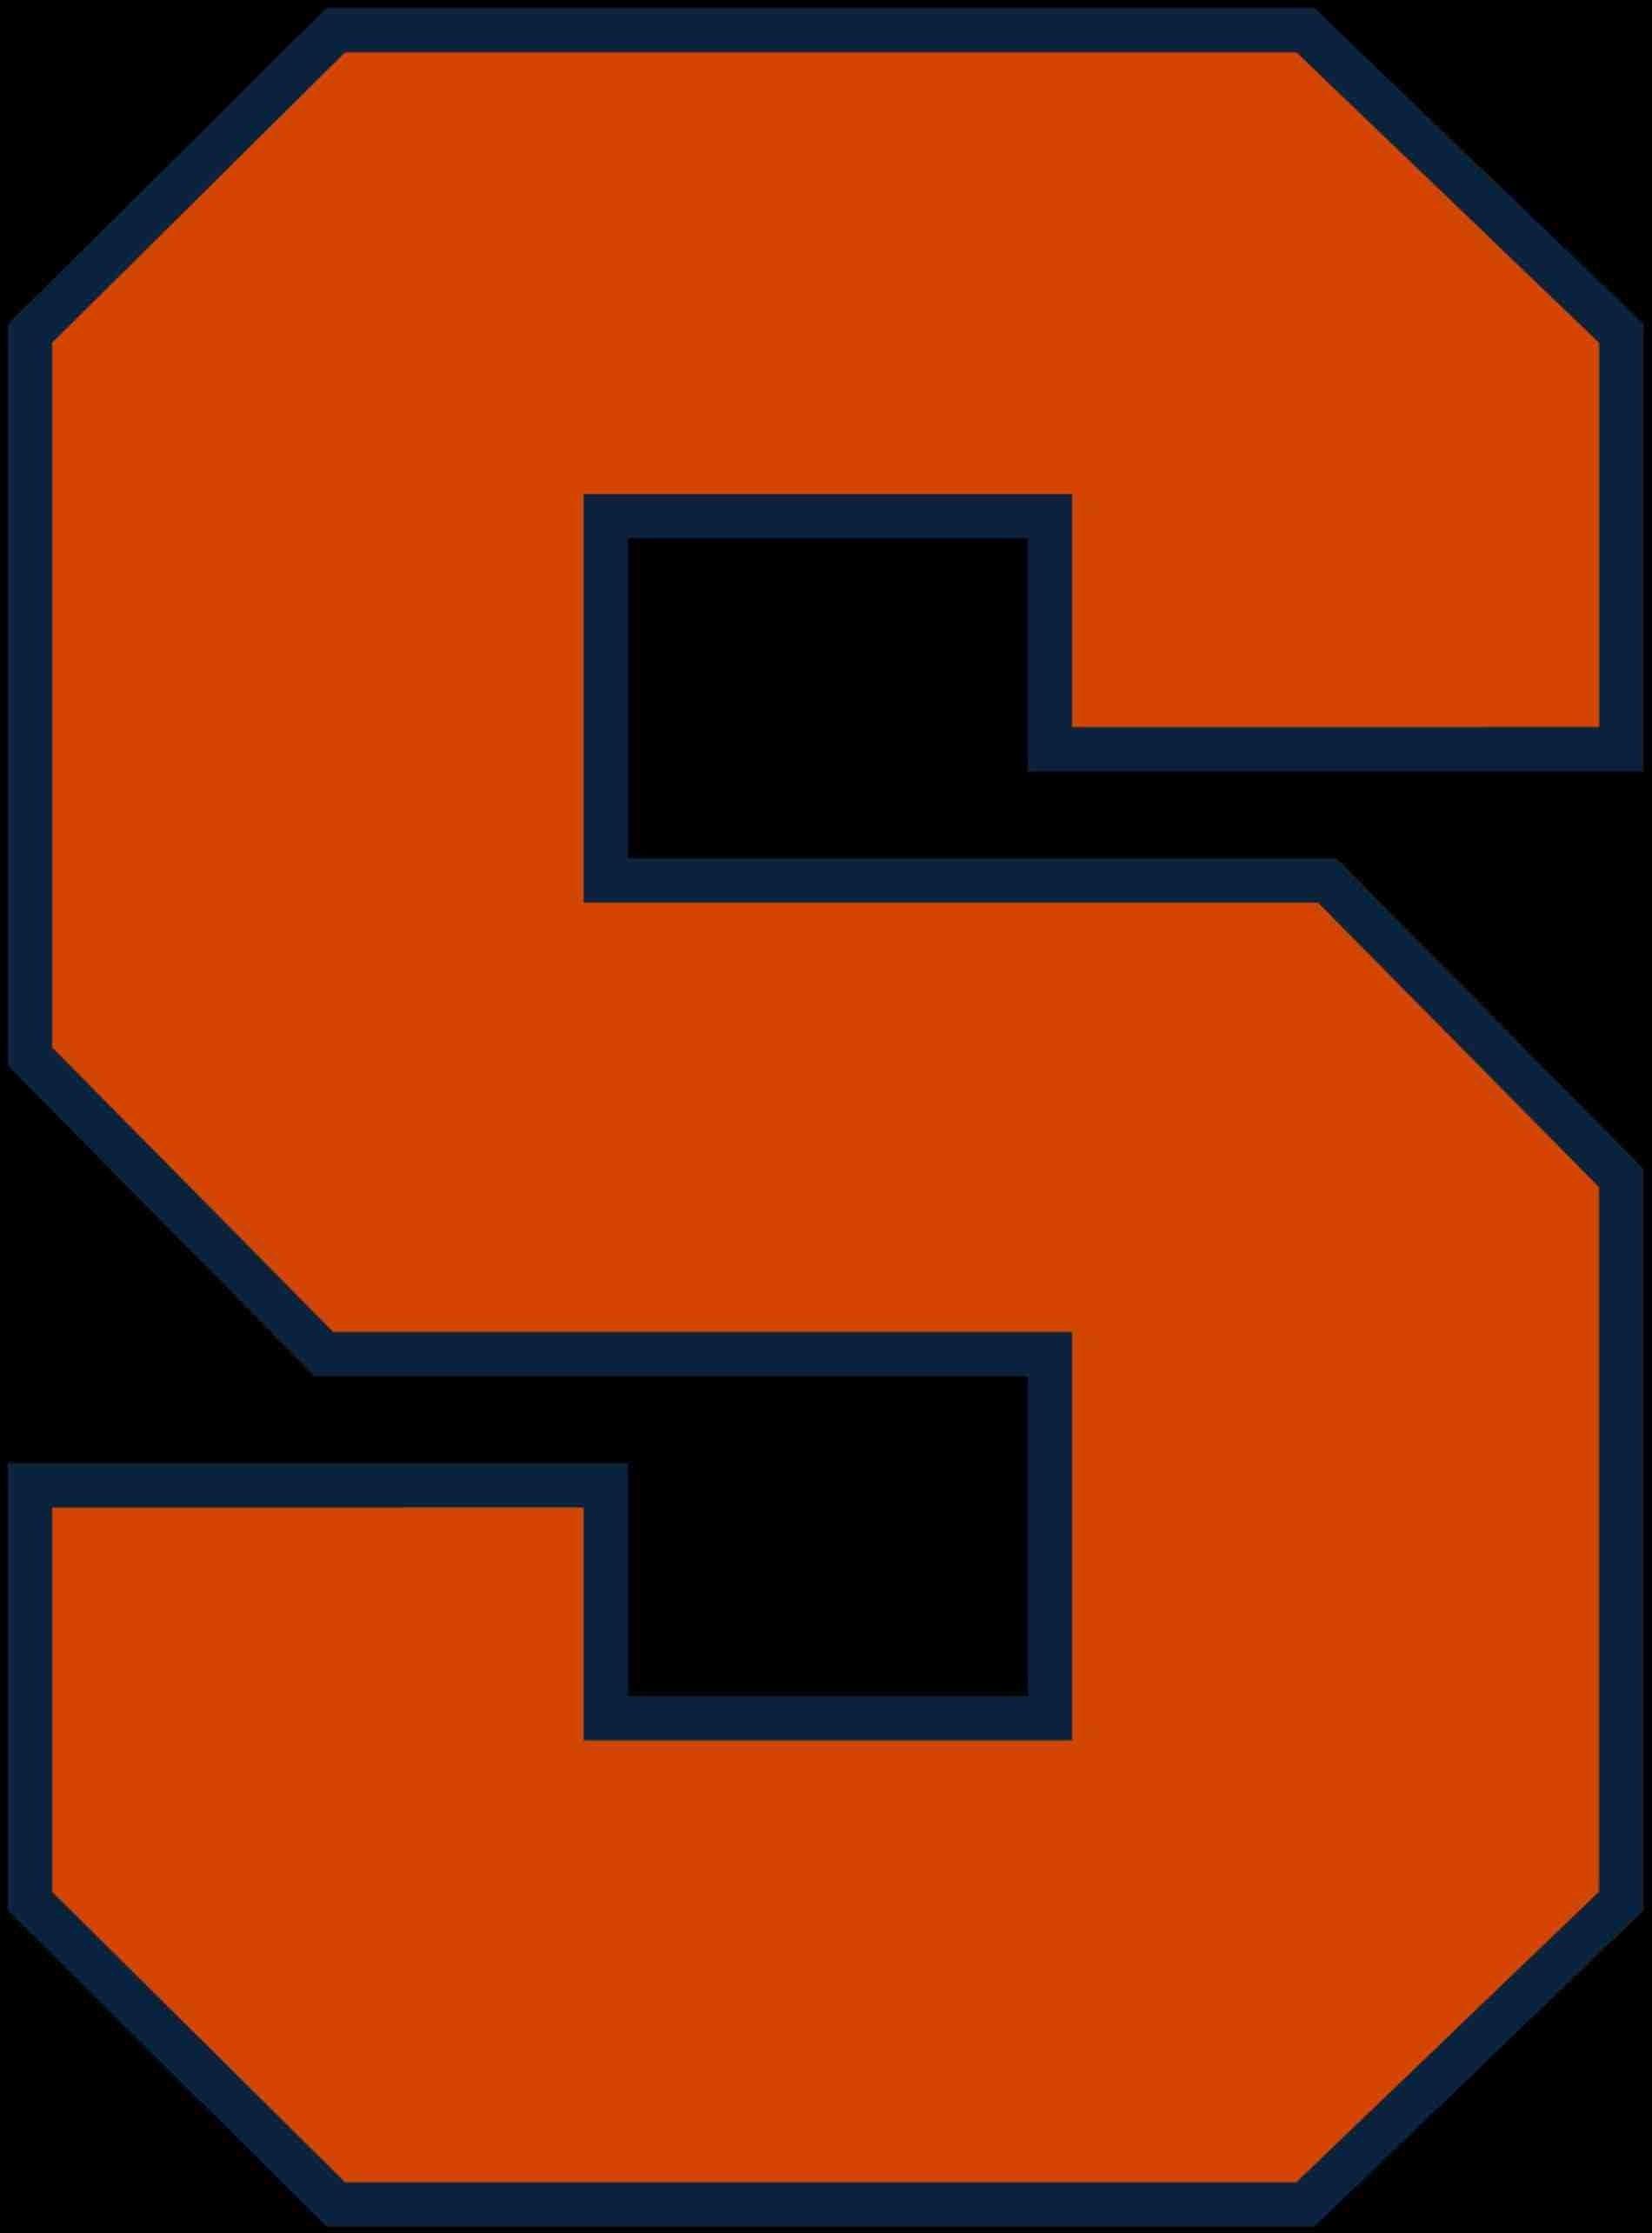 Res: 1900x2568, ... Syracuse syracuse basketball logo orange menus soccer  wikipediarhenwikipediaorg university logo roundel mat  rheverythingdoormatscom university syracuse ...